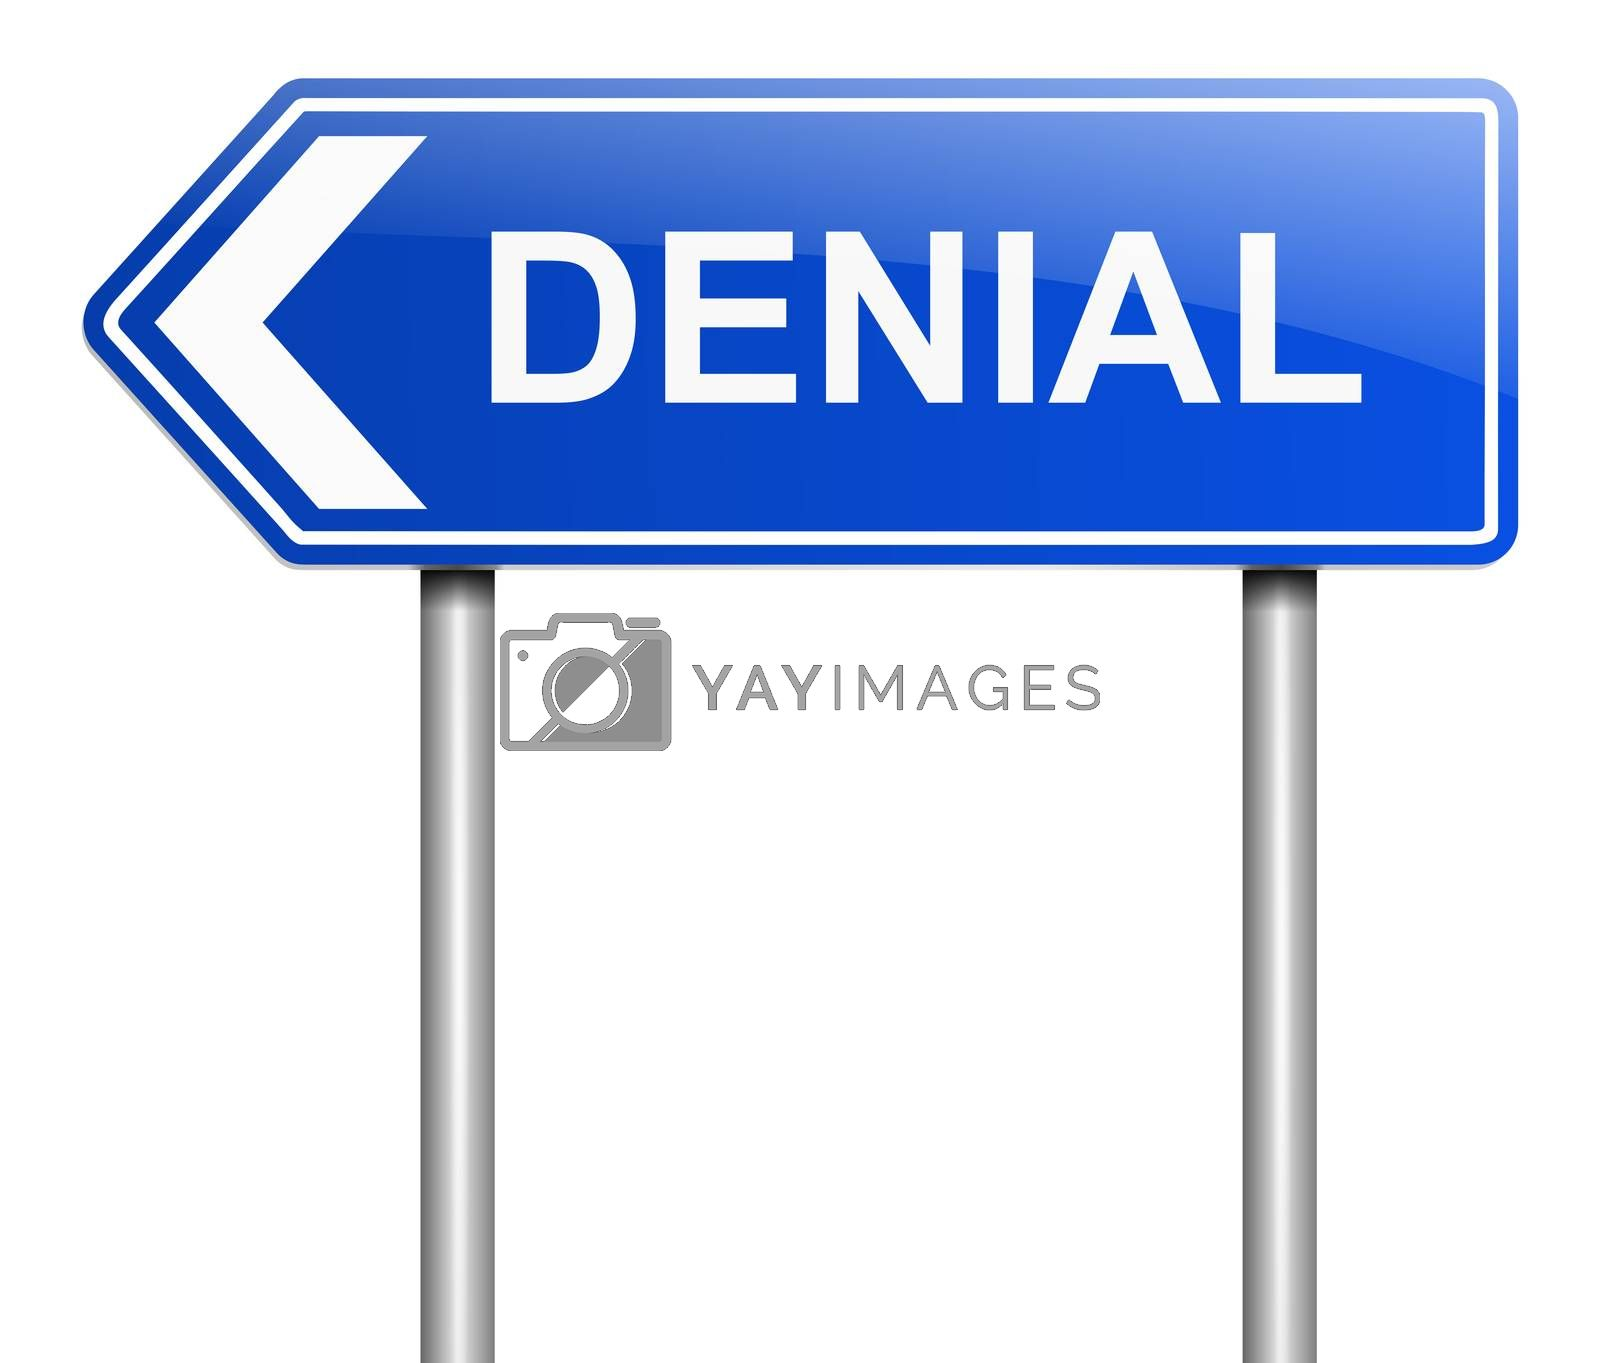 Denial concept. by 72soul